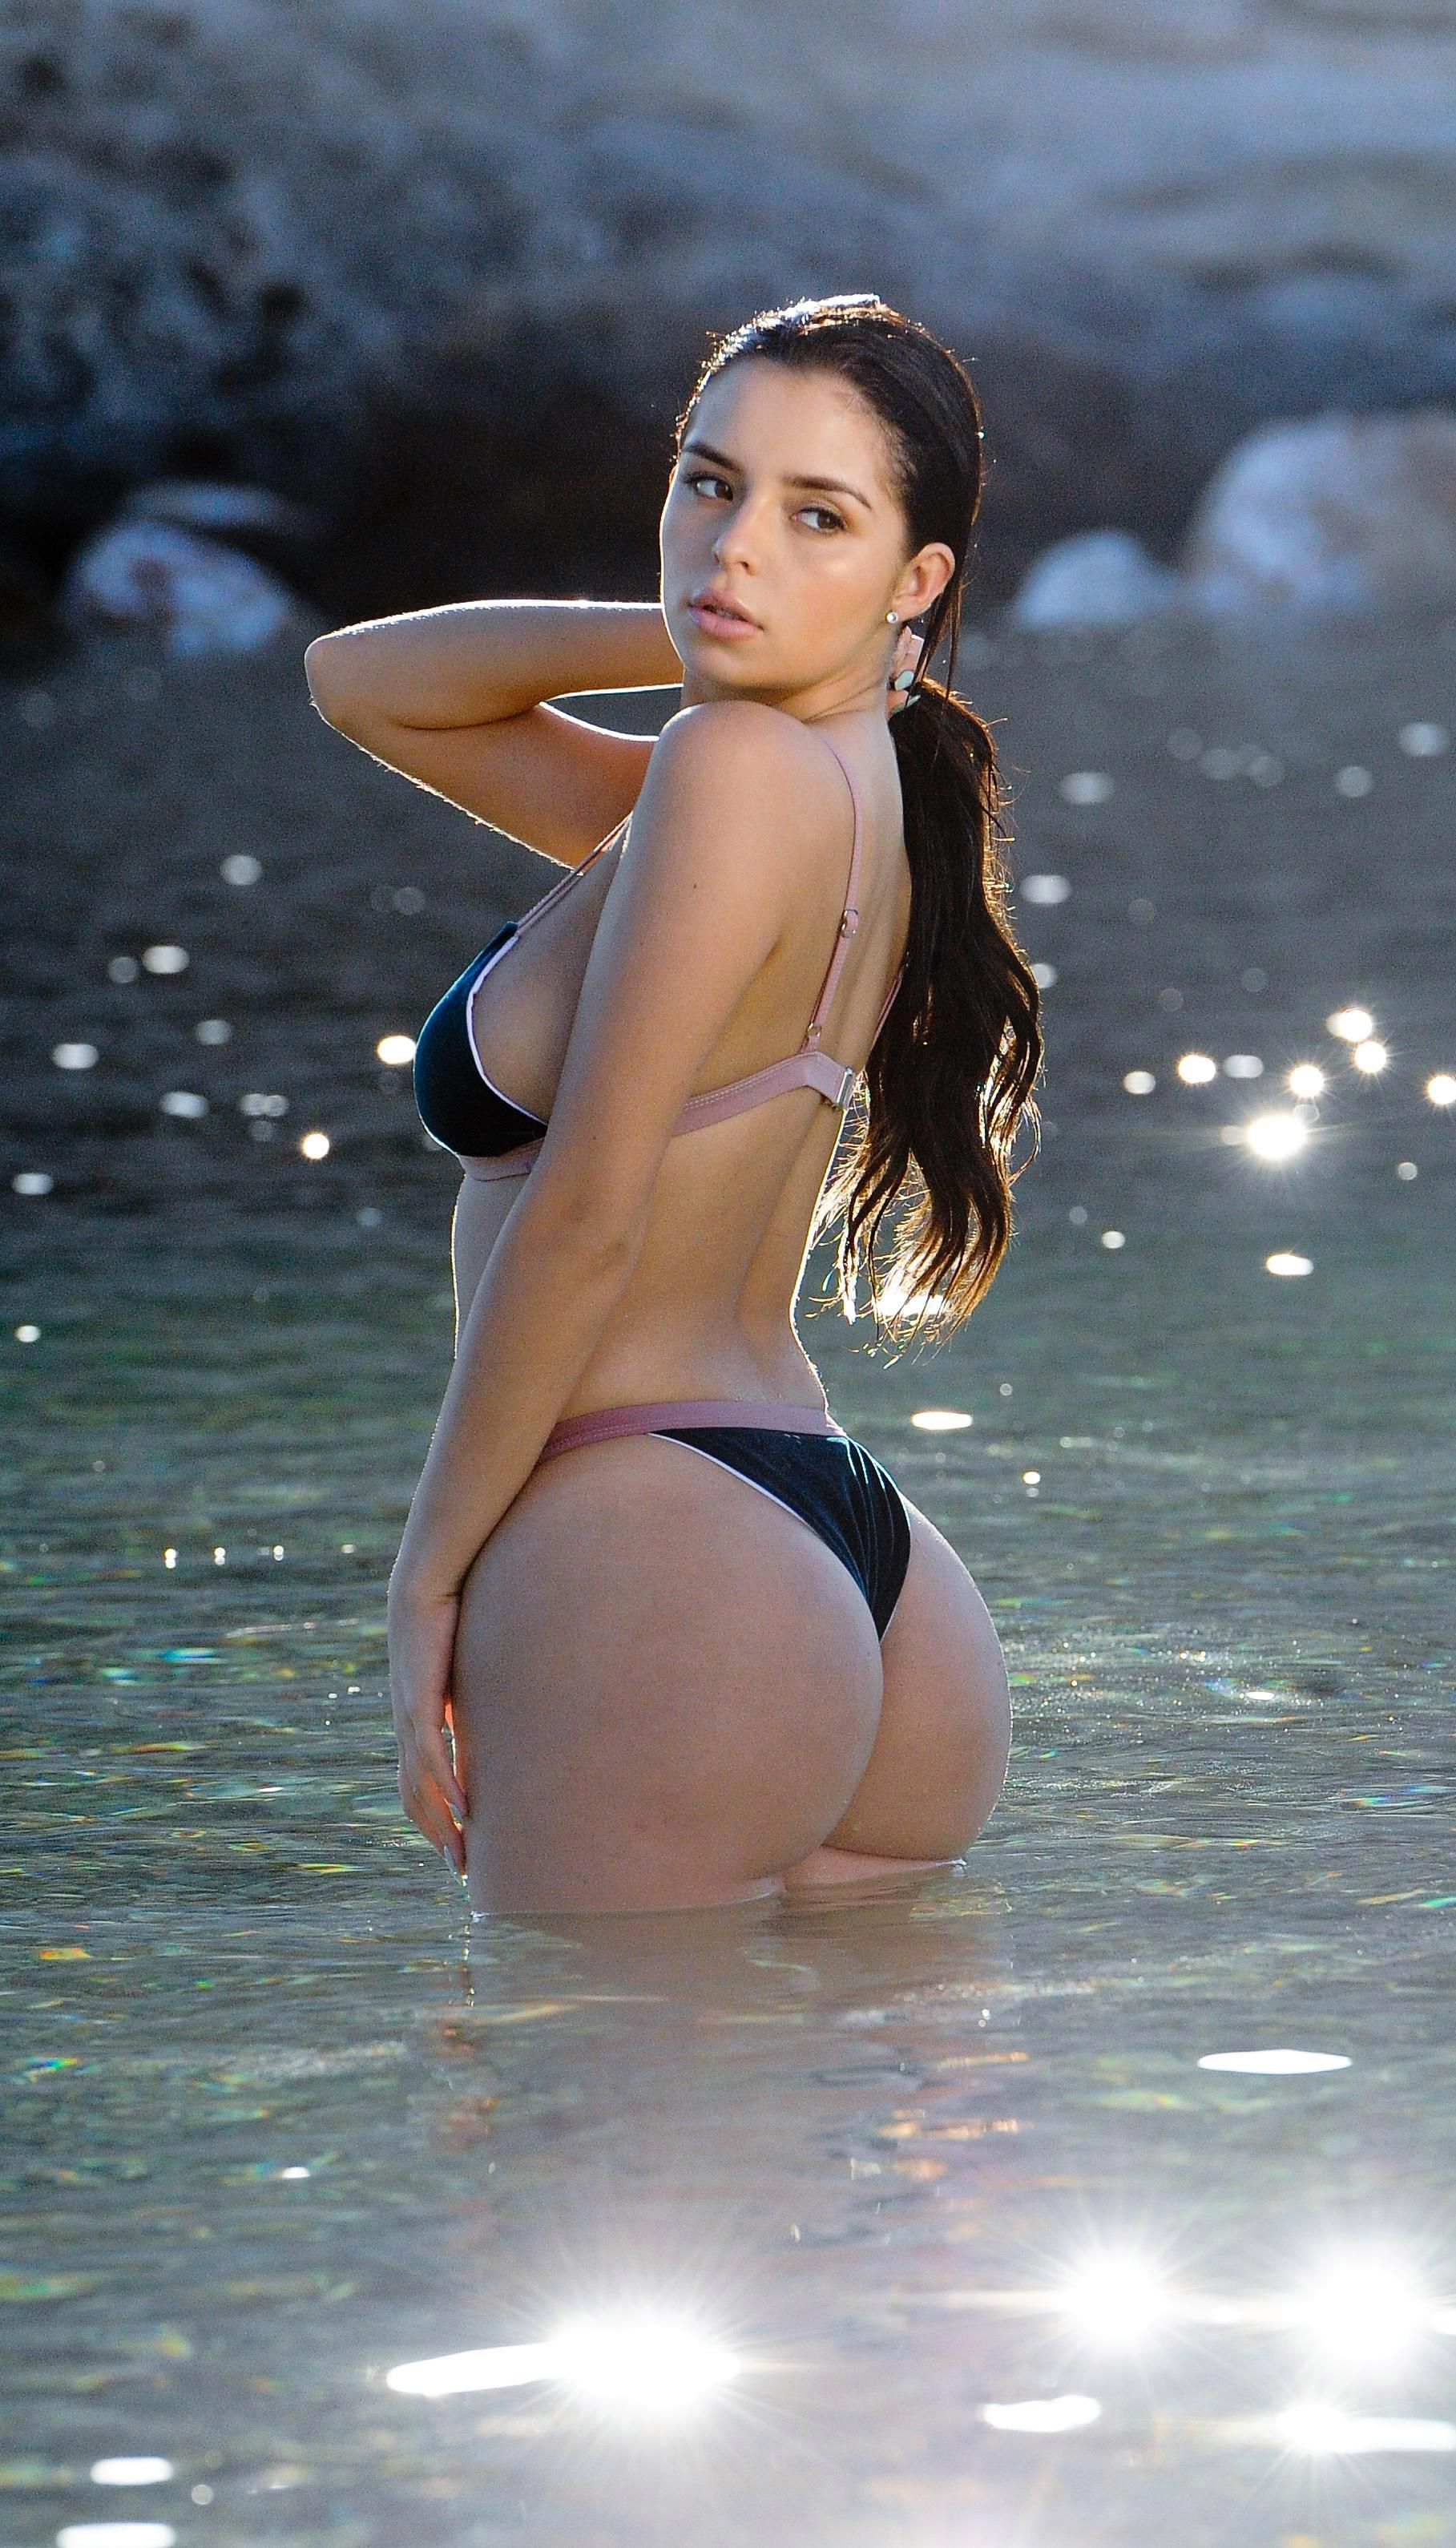 Brunette Sexy Ass! Amazing